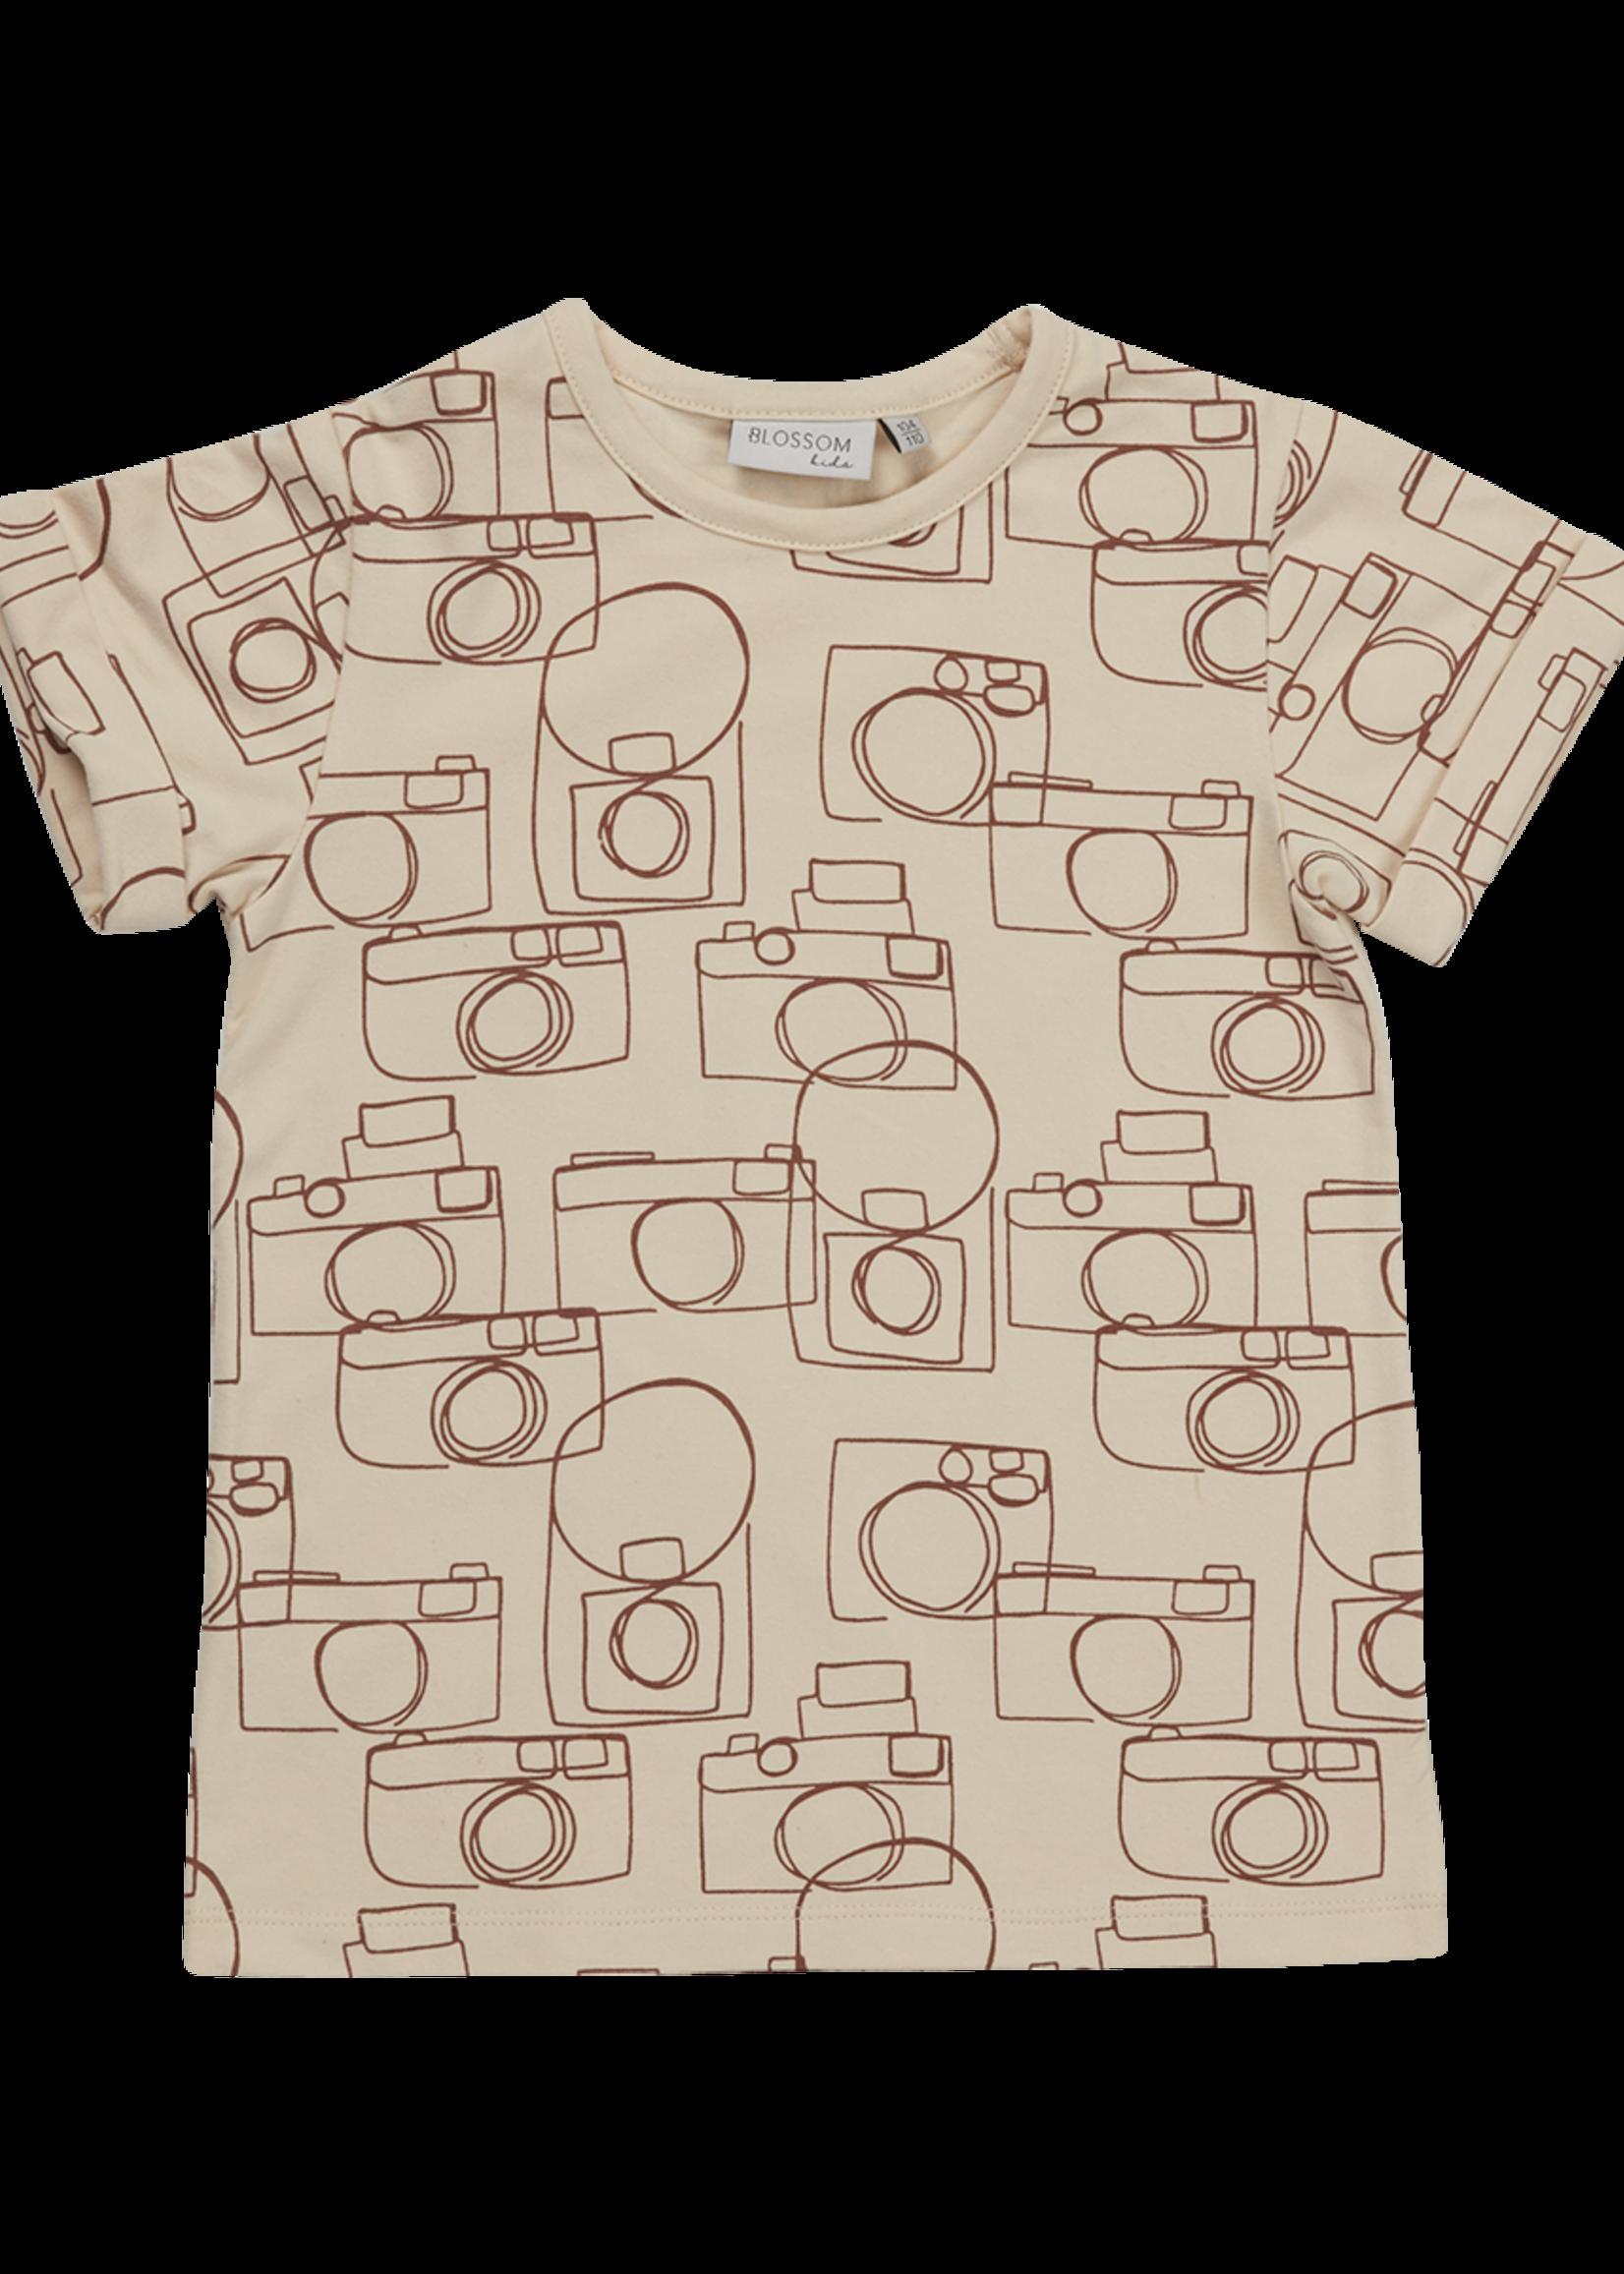 Blossom Kids T-shirt Camera Chaos - Soft Sand